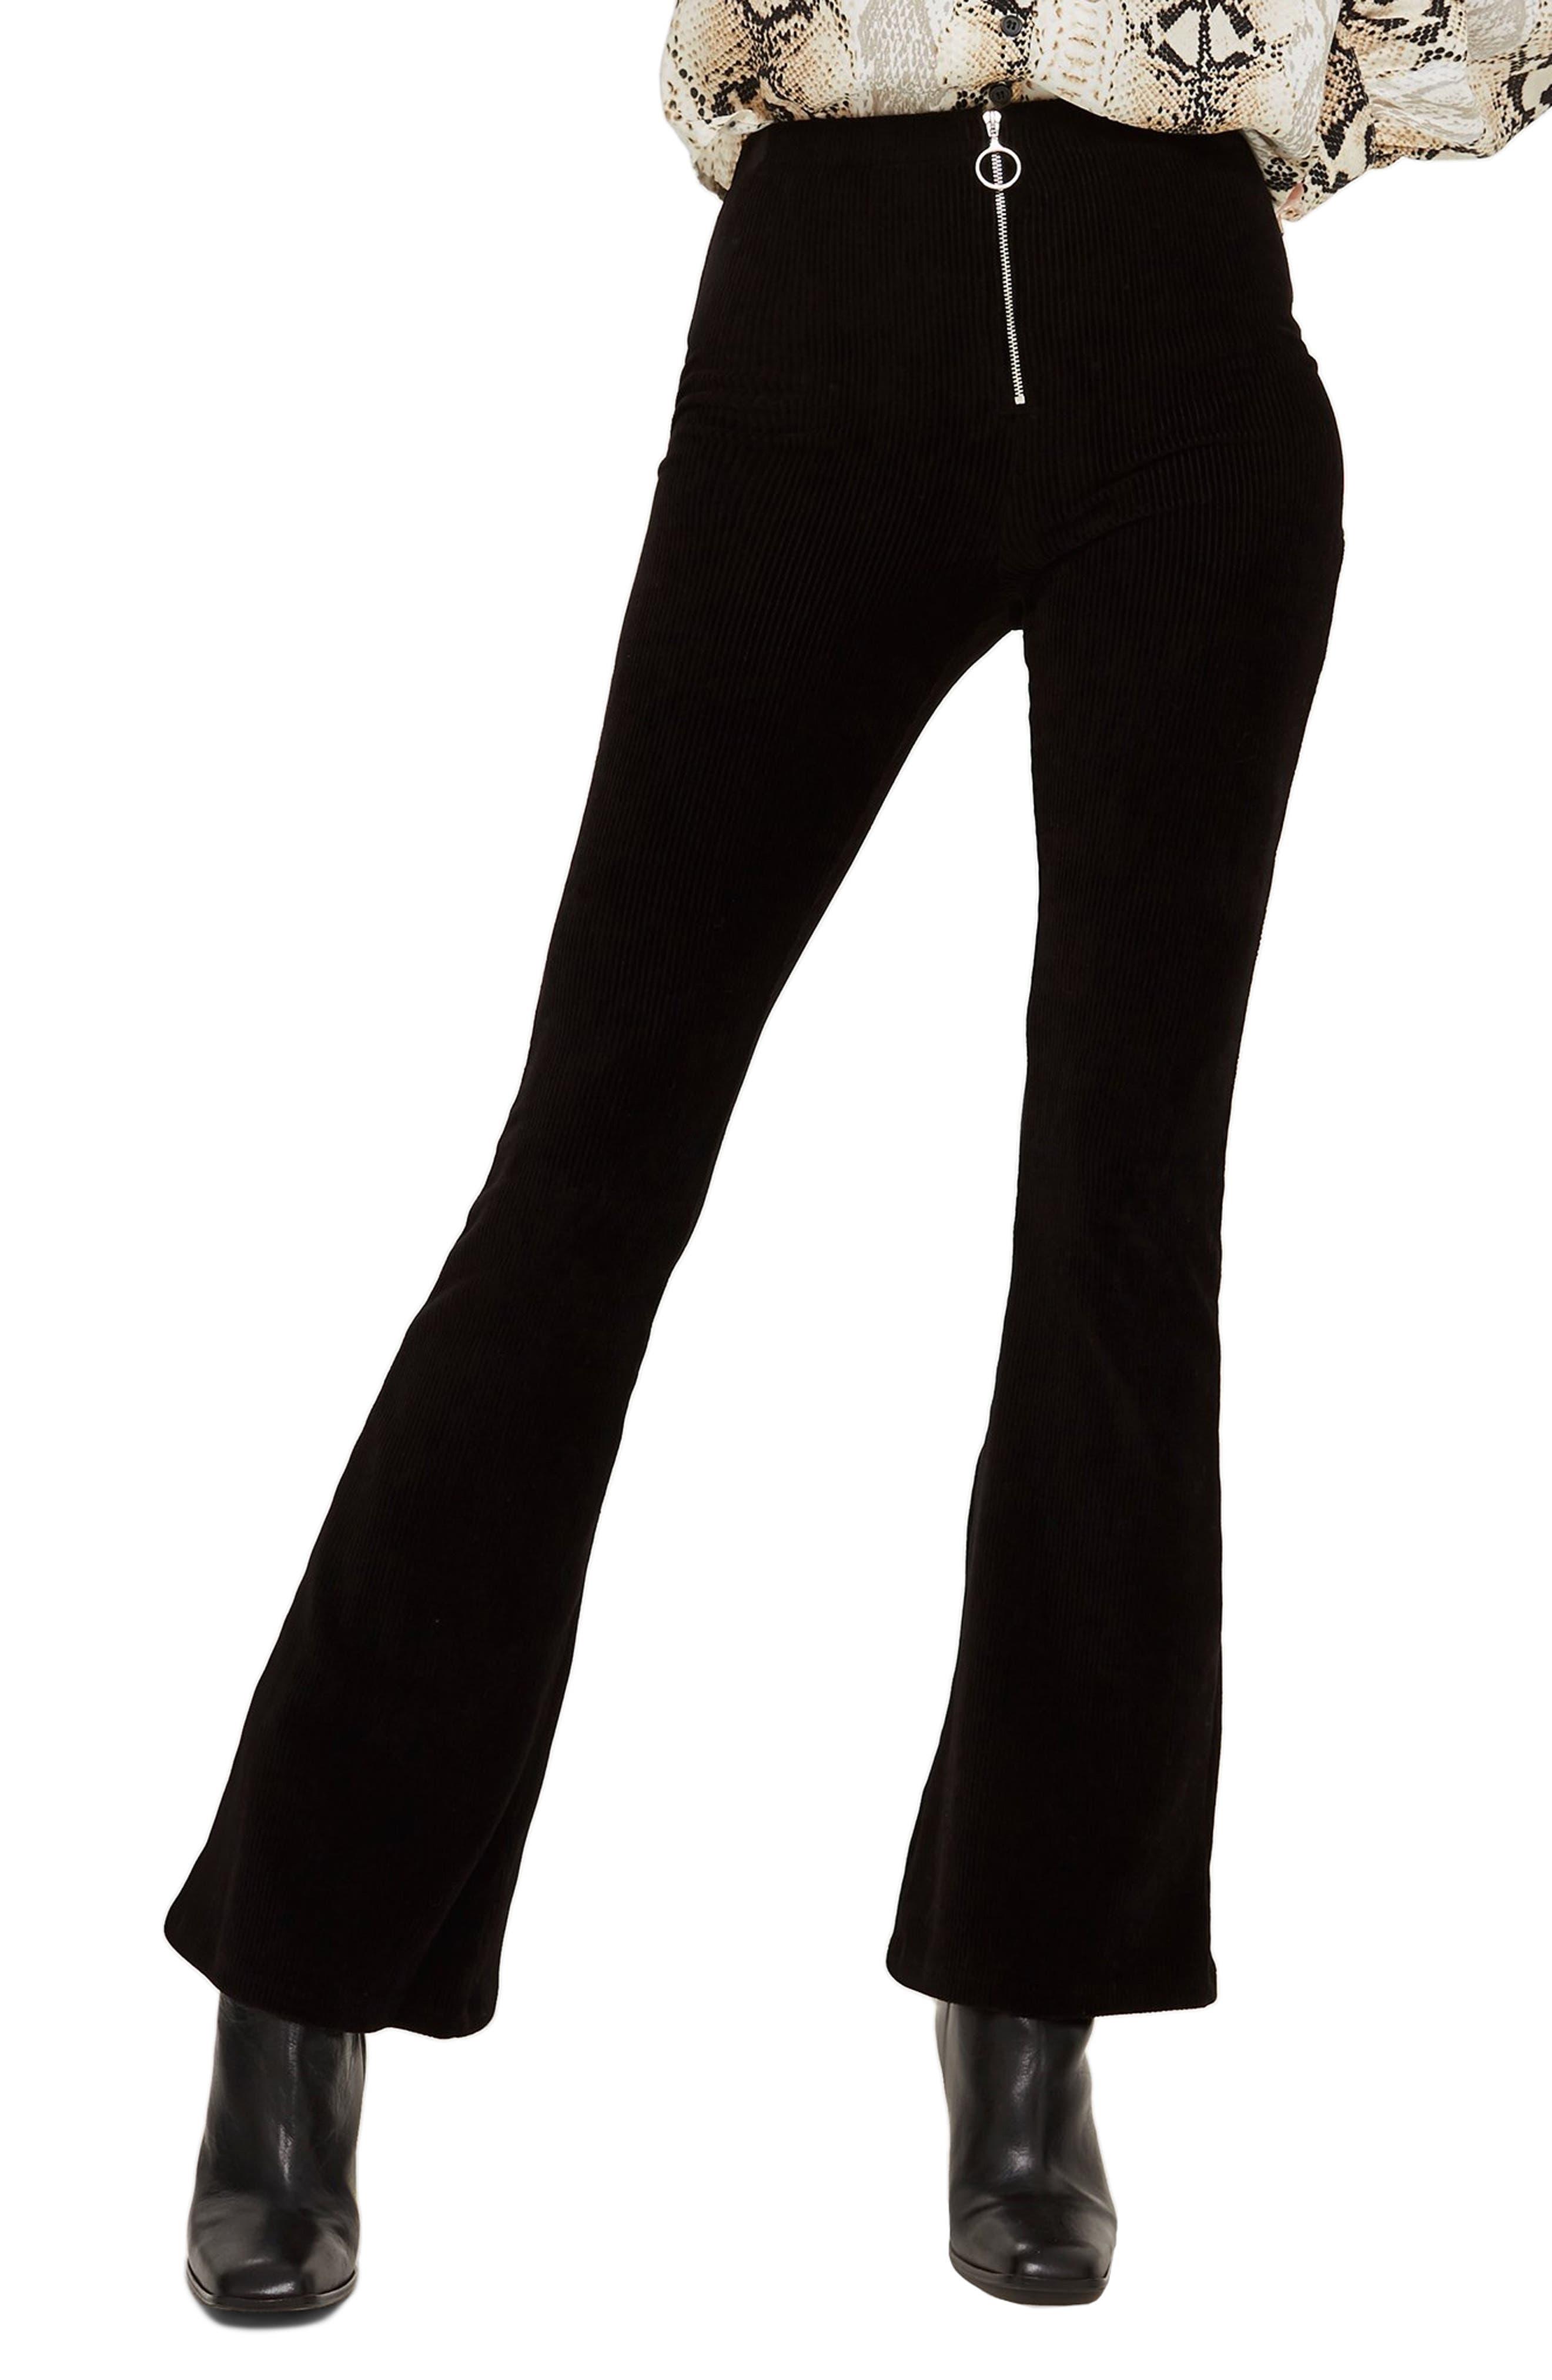 Zip Flare Corduroy Pants,                             Main thumbnail 1, color,                             BLACK